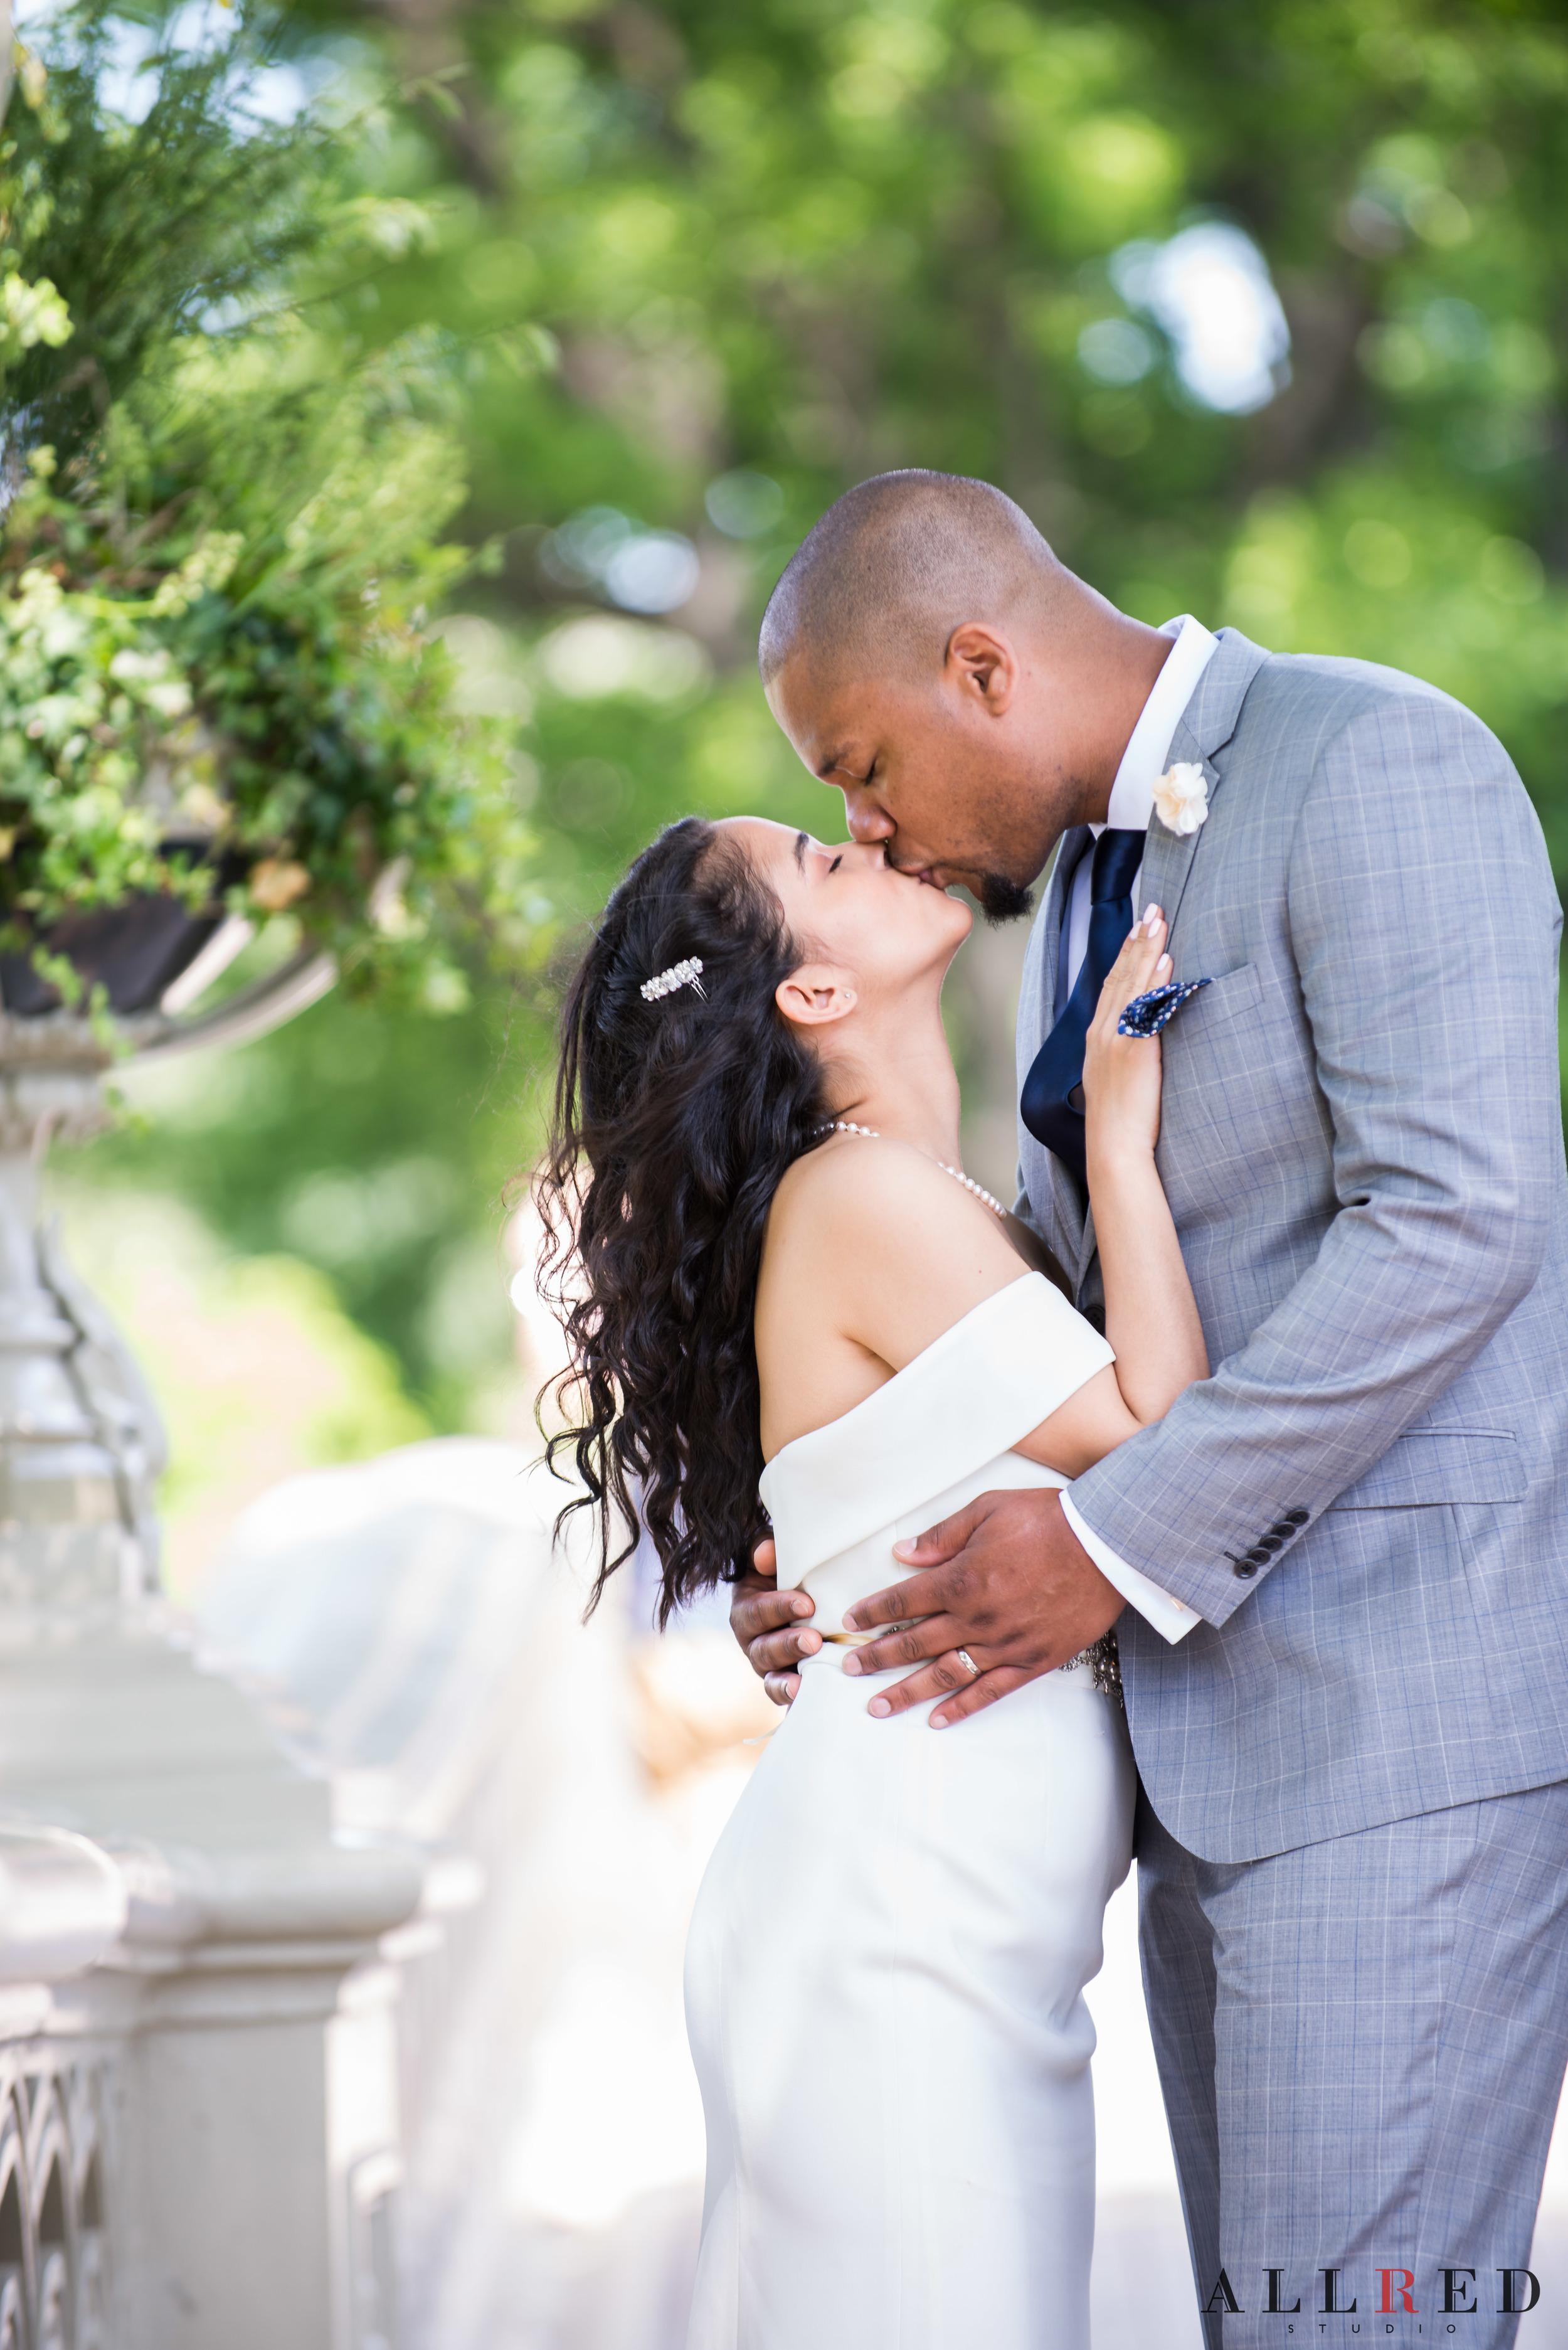 Wedding-central-park-allred-studio-new-york-photographer-new-jersey-hudson-valley-2473.jpg